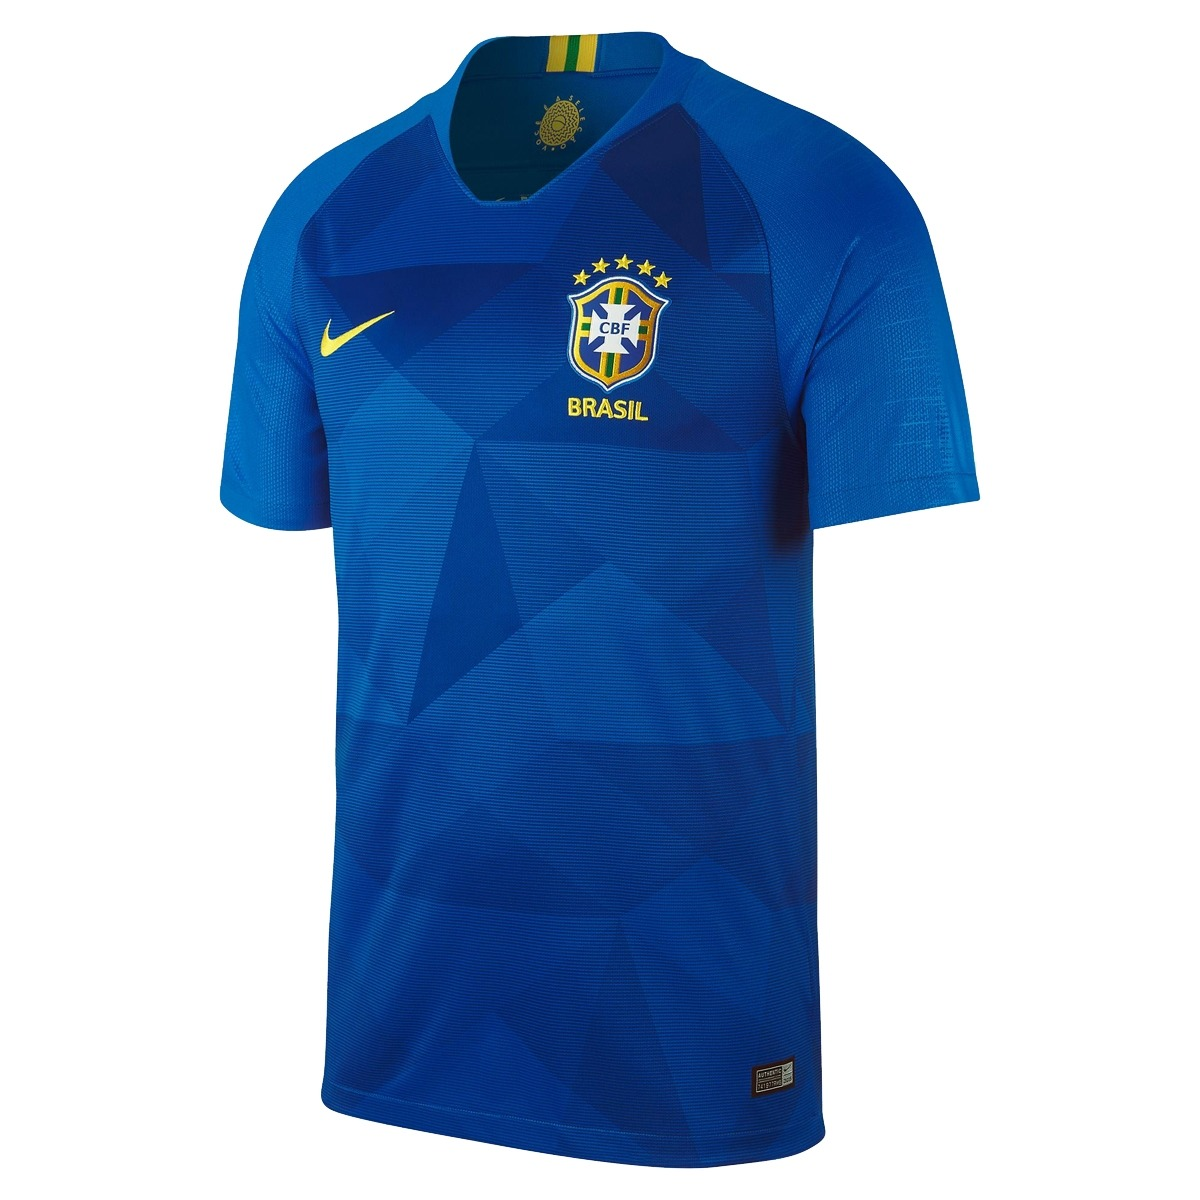 camisa nike brasil ii 2018 19 torcedor masculina m. Carregando zoom. 133027ea0fbef